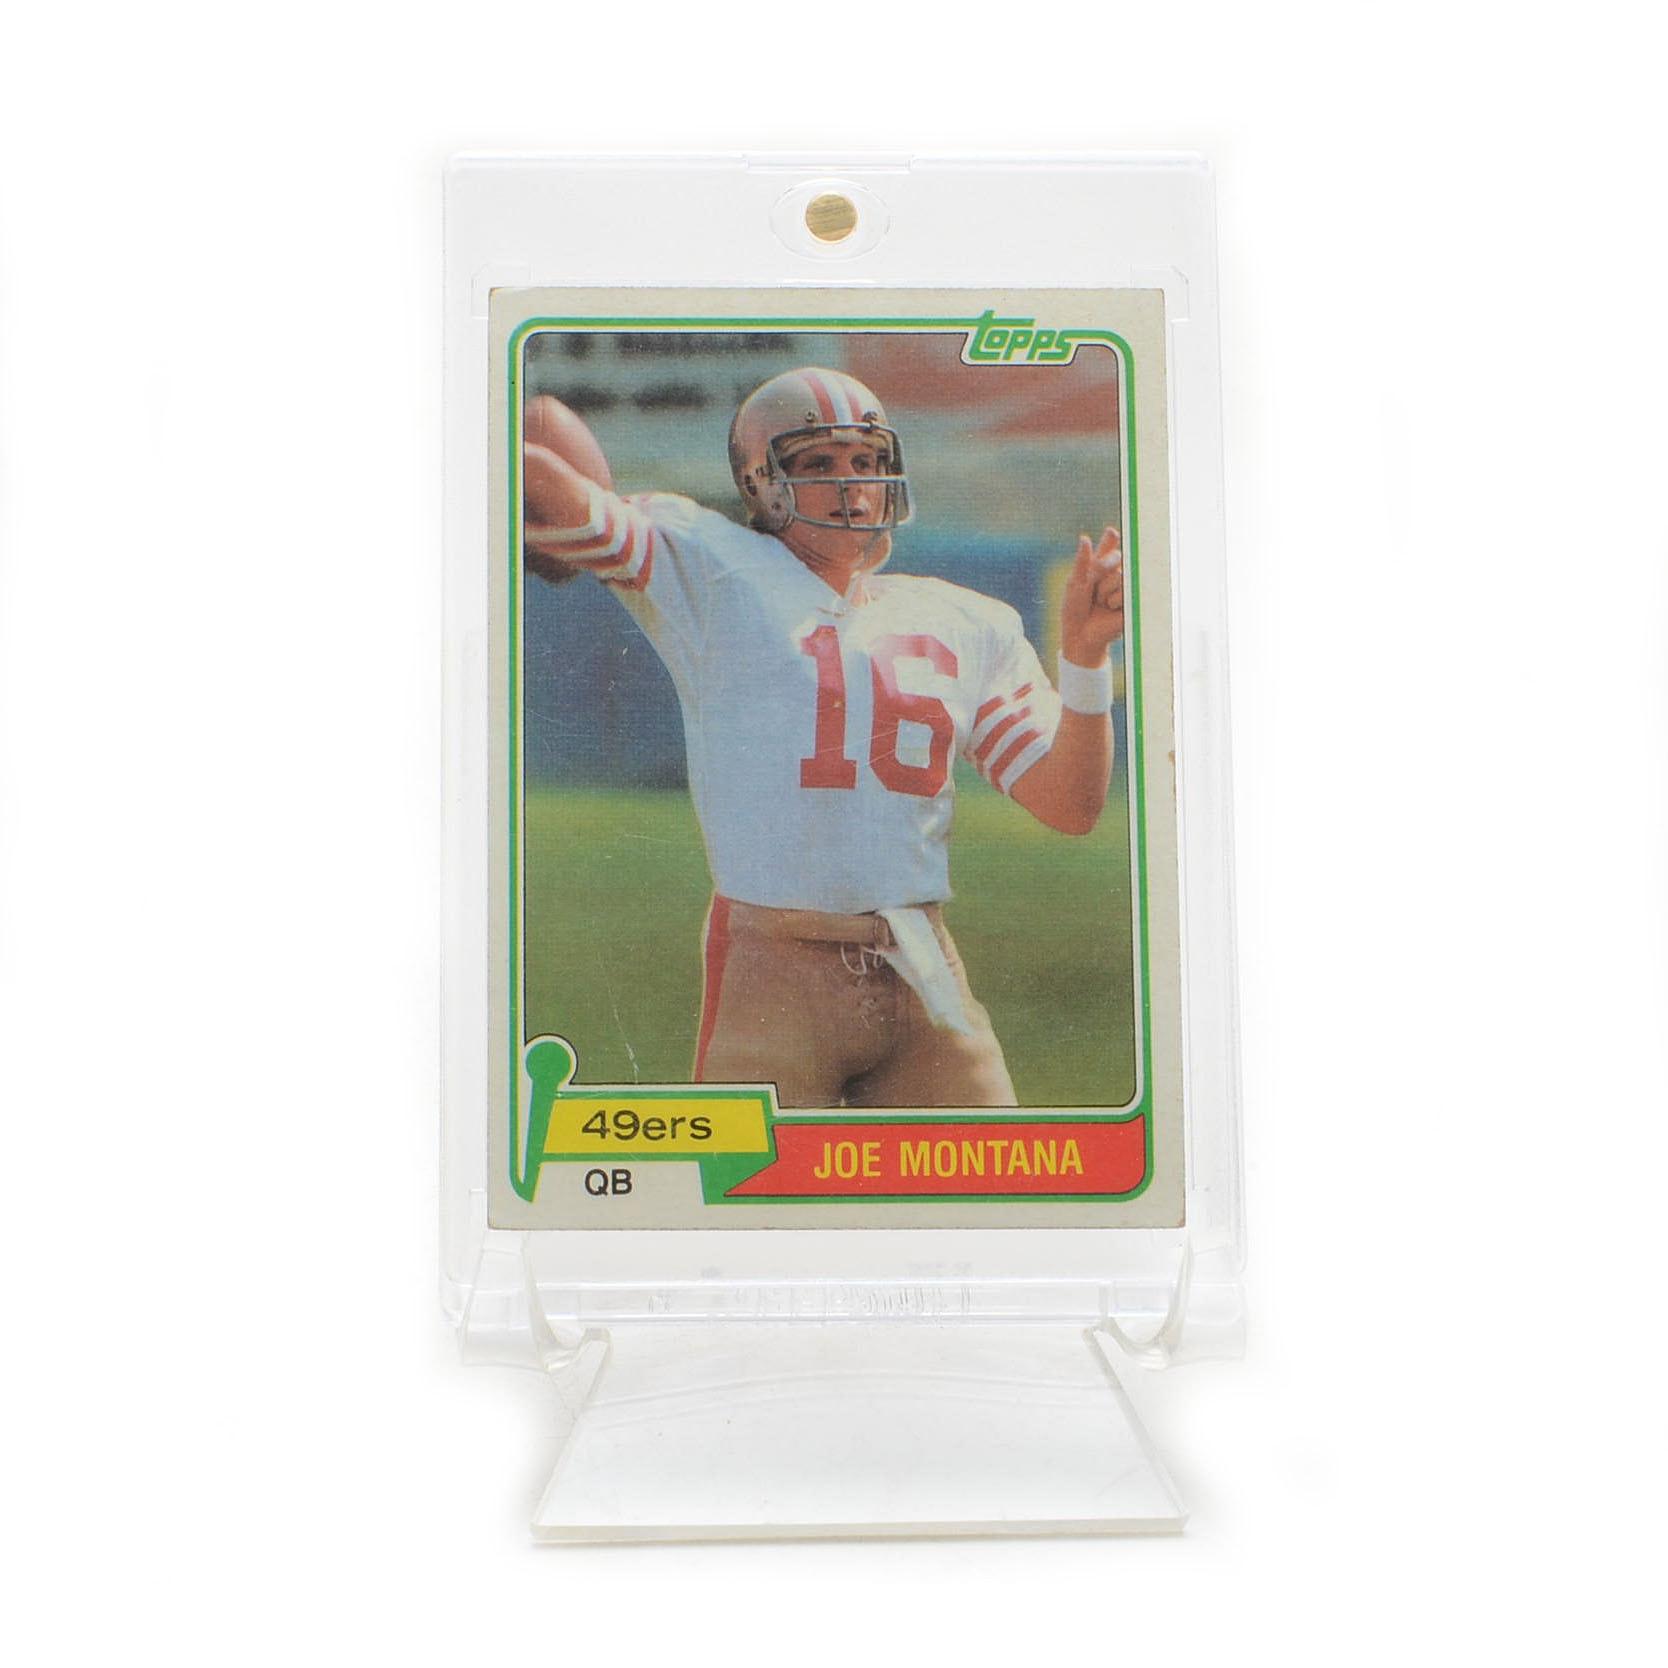 1981 Joe Montana San Fransisco 49ers Topps Rookie Football Card